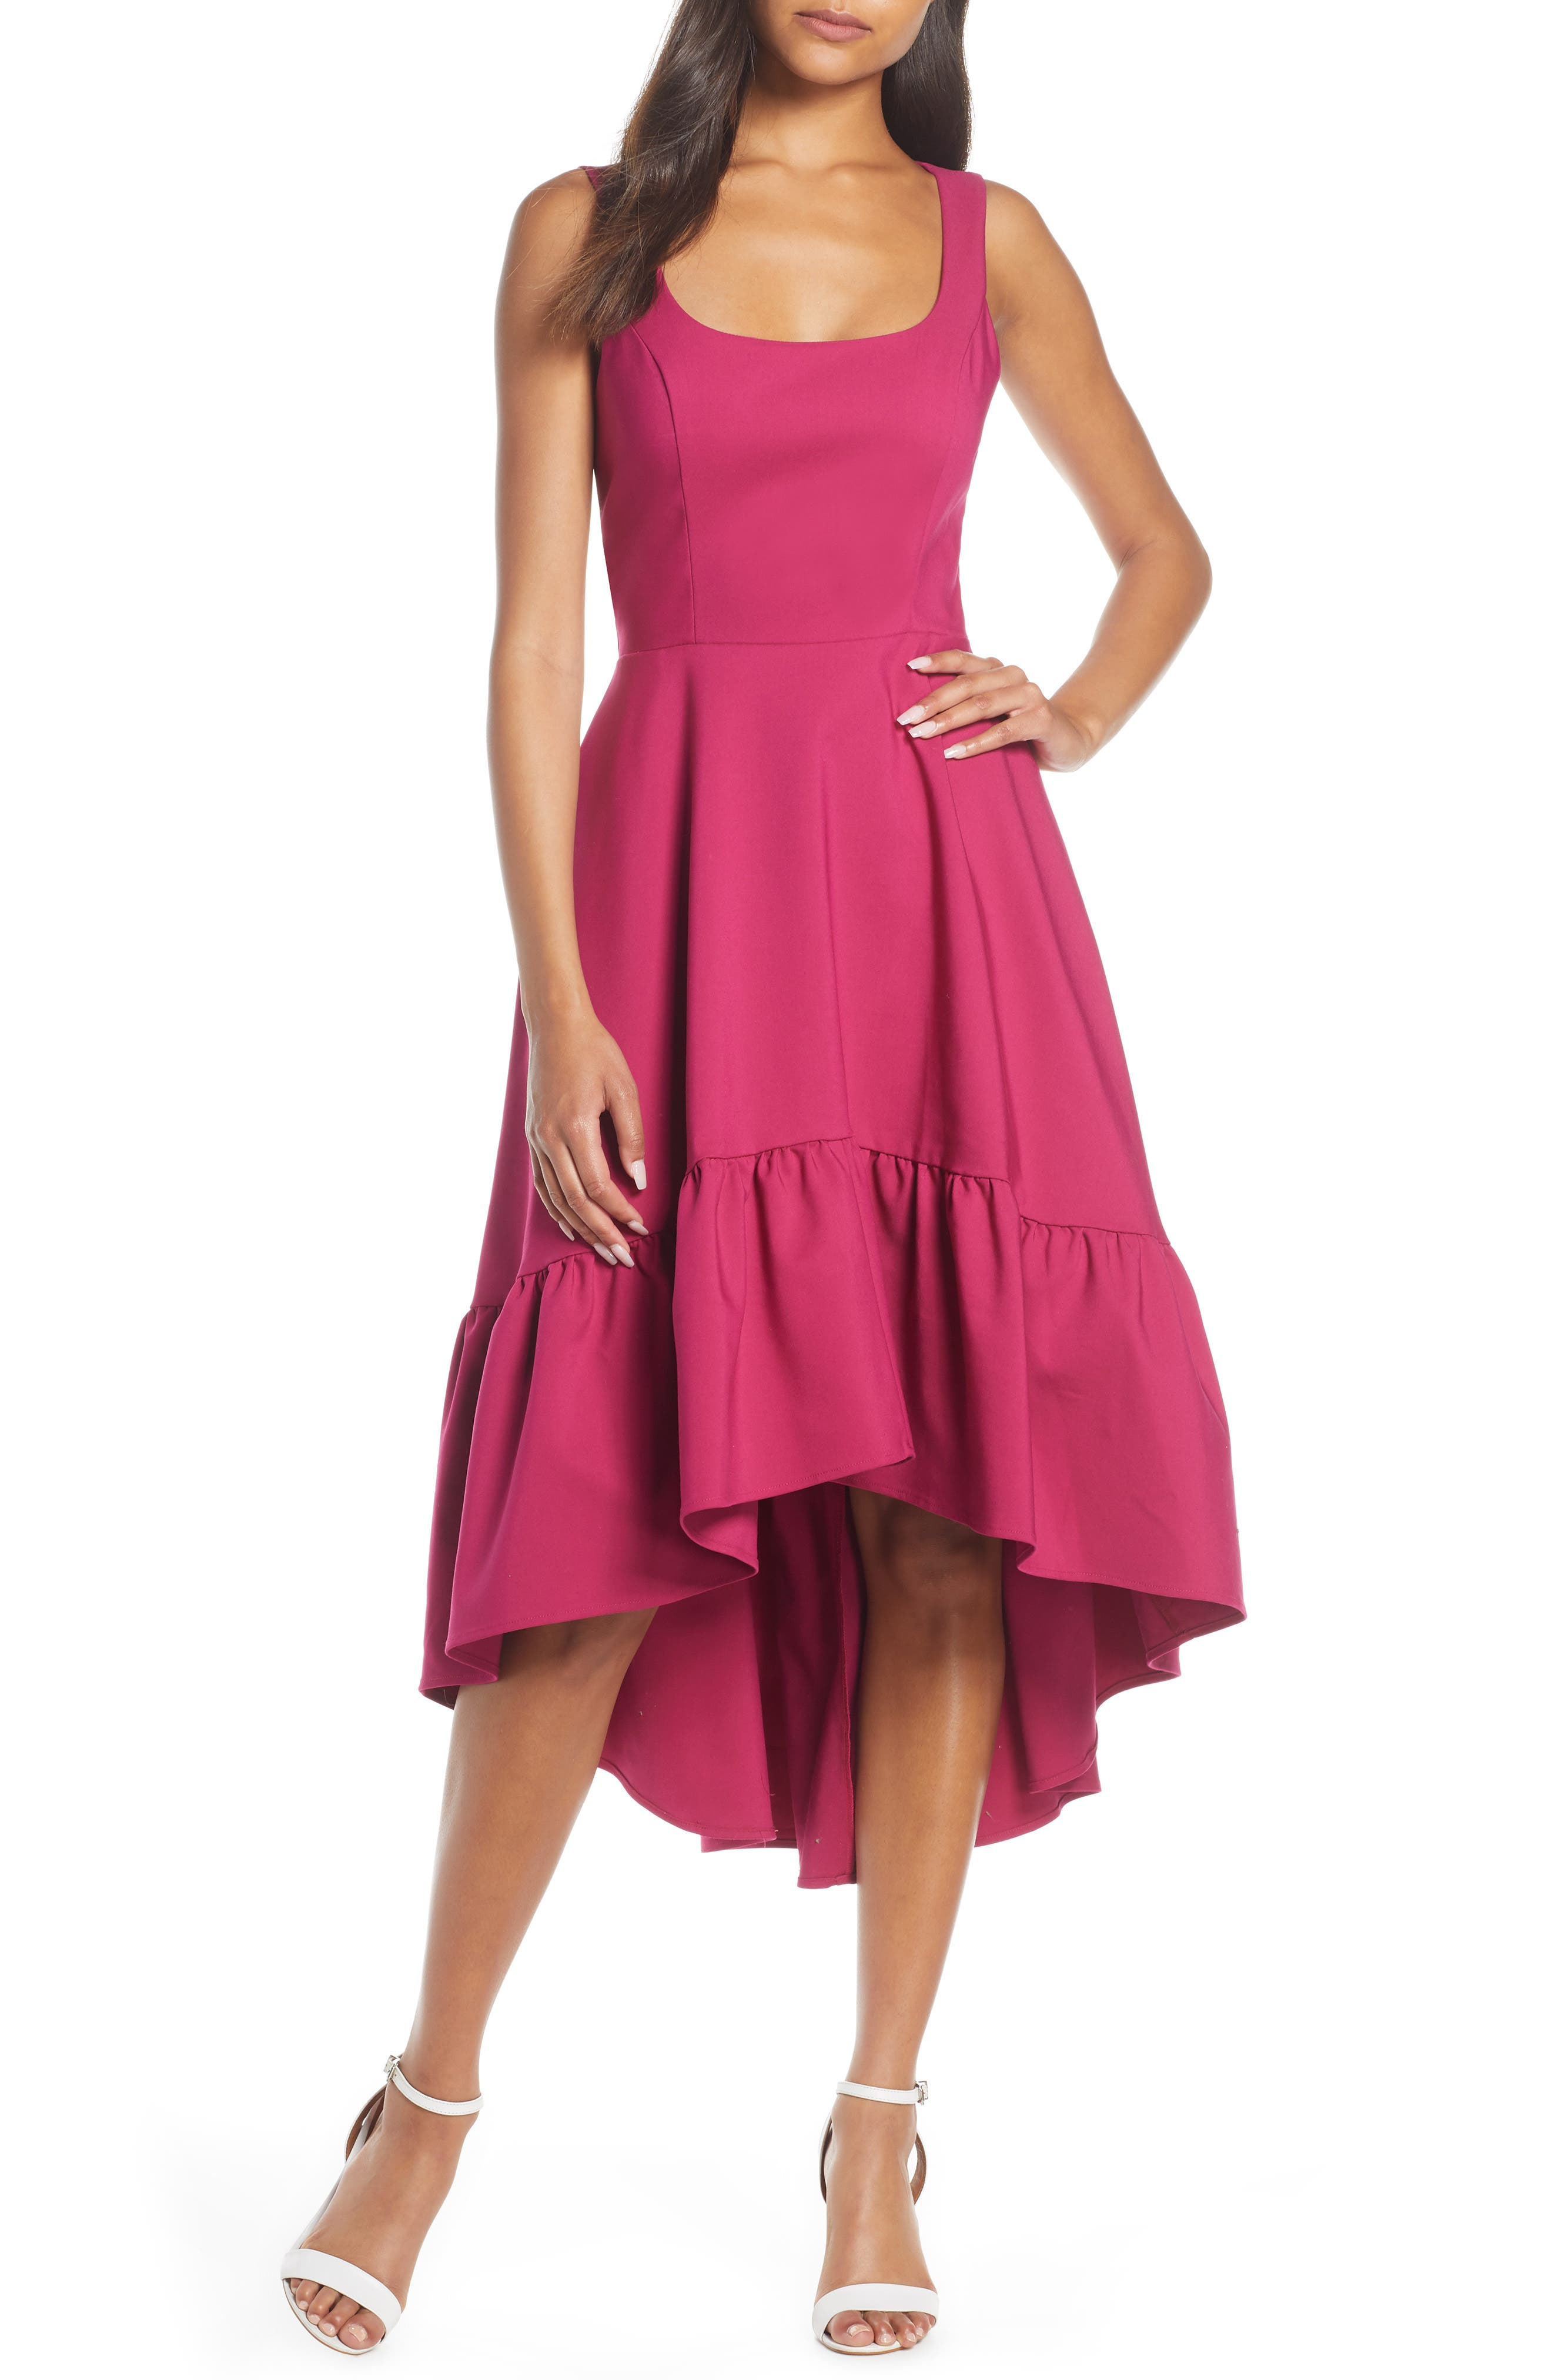 Mark & James Badgley Mischka High/low Ruffle Hem Dress, Pink